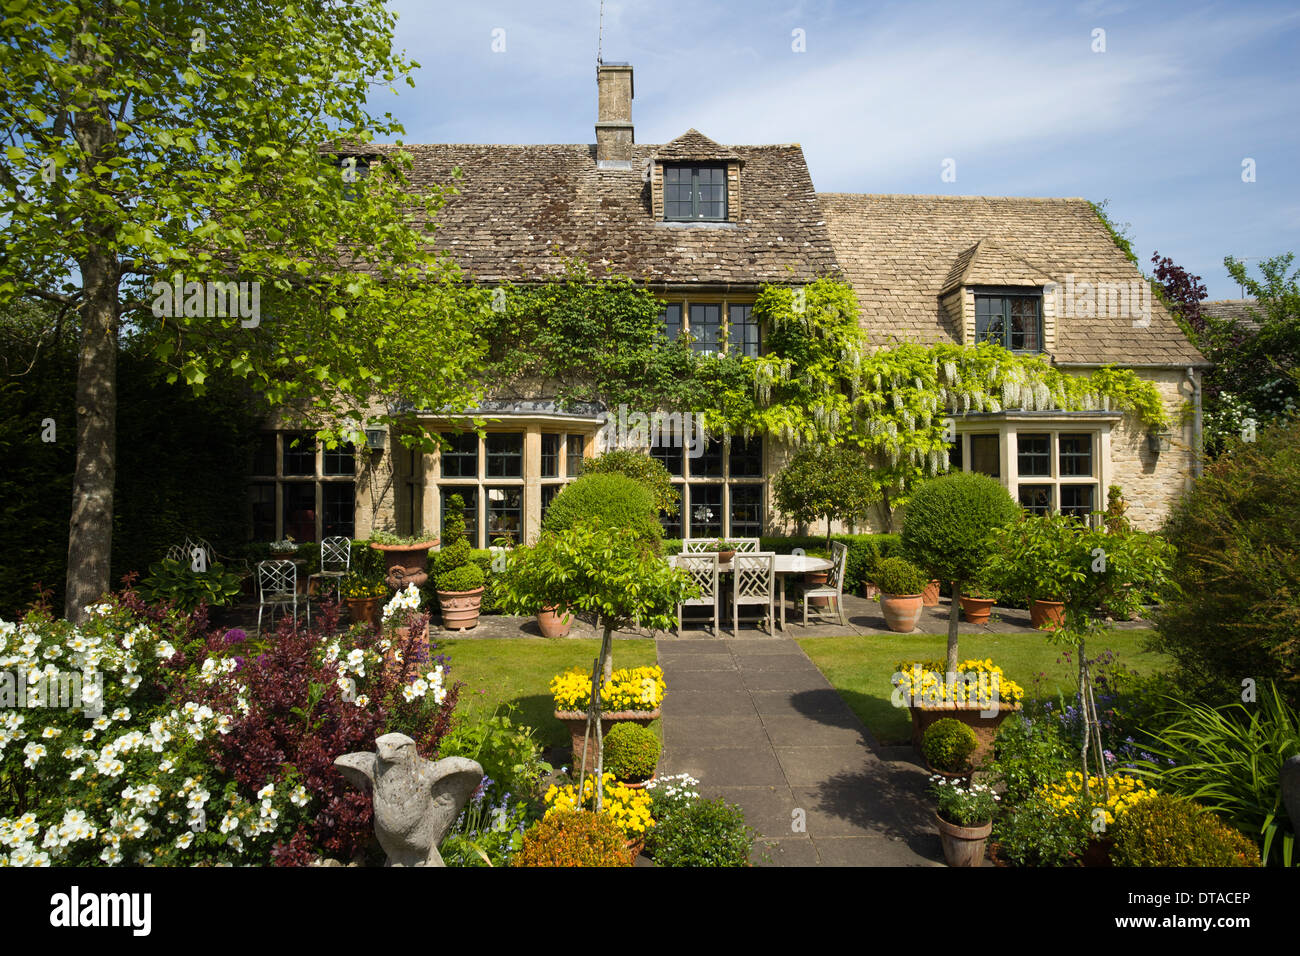 An idyllic Cotswold cottage and garden, Gloucestershire, England, UK - Stock Image